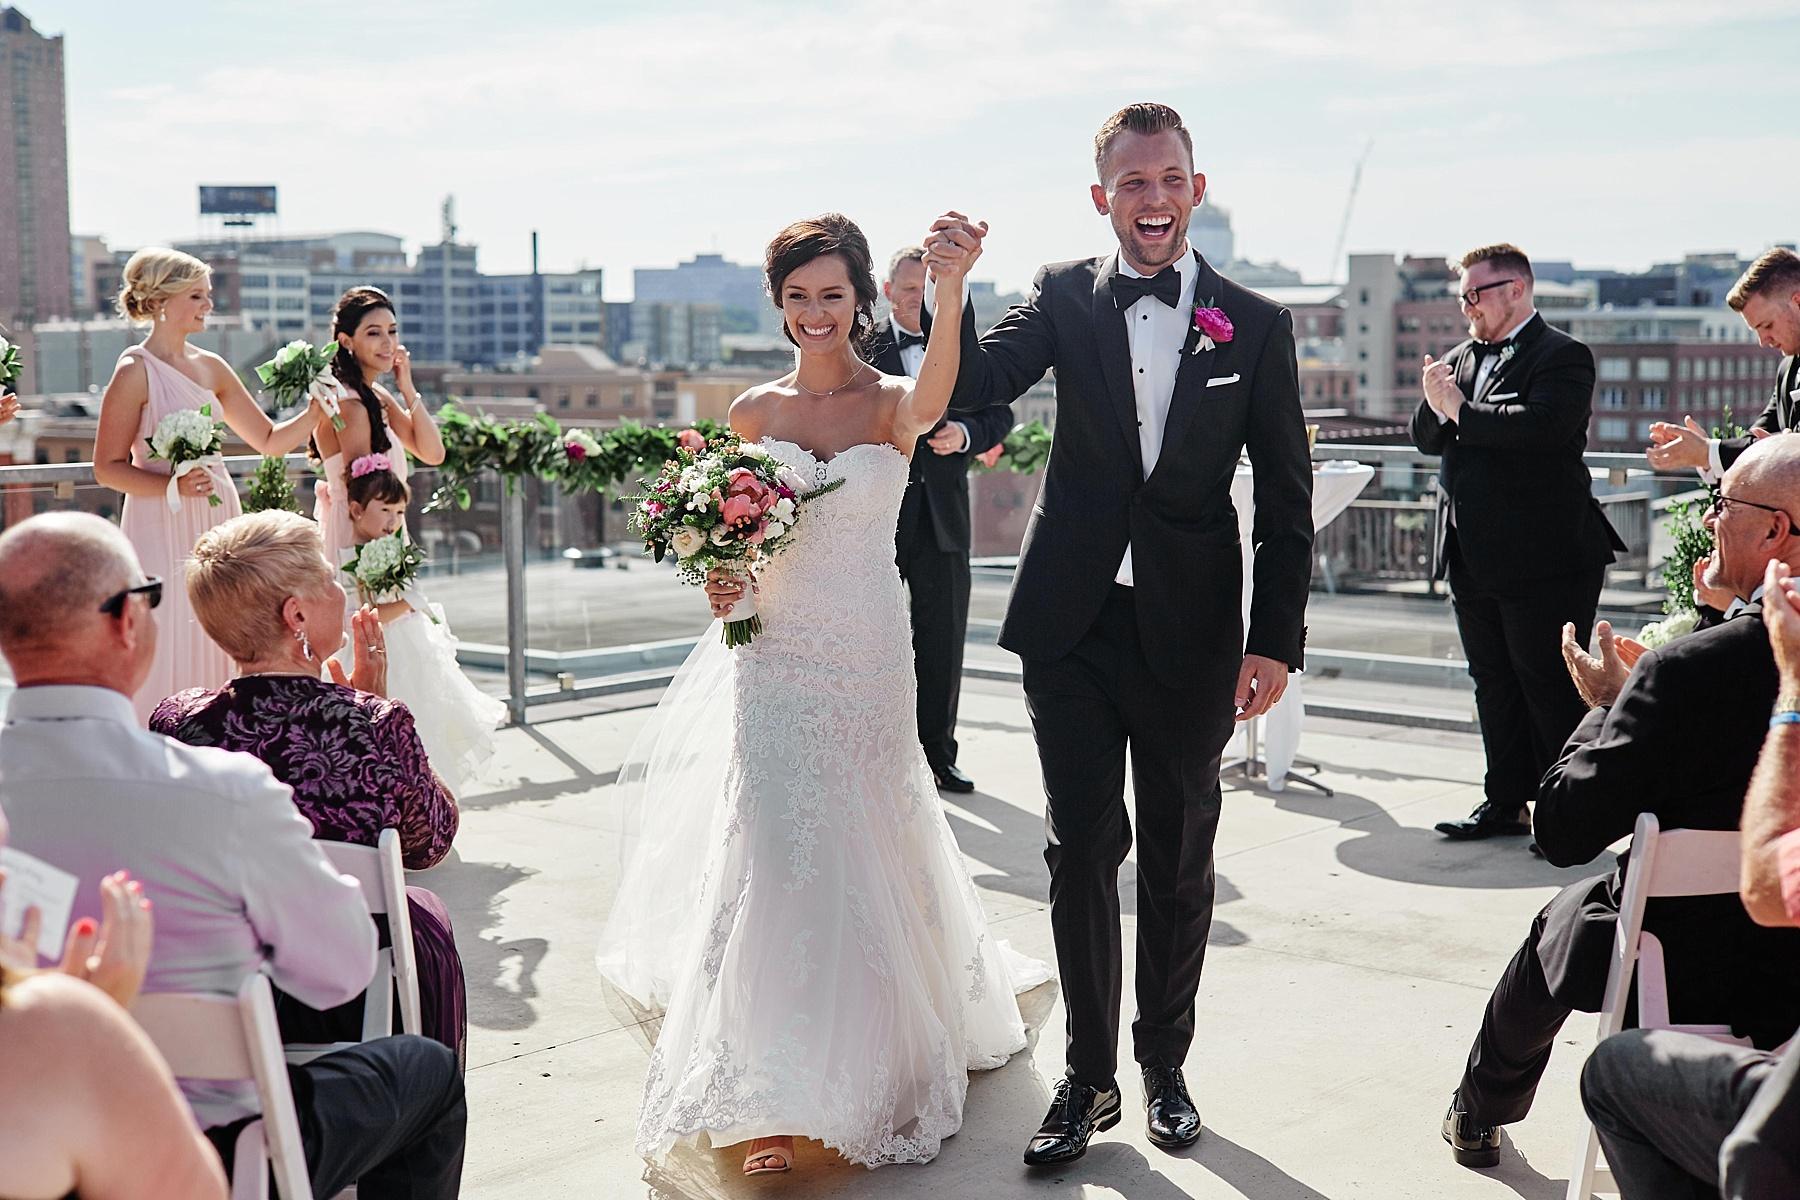 ABULAE-Wedding-Saint-paul-MN-Josh-Sofia-Wedding-Mears-Park_0776.jpg